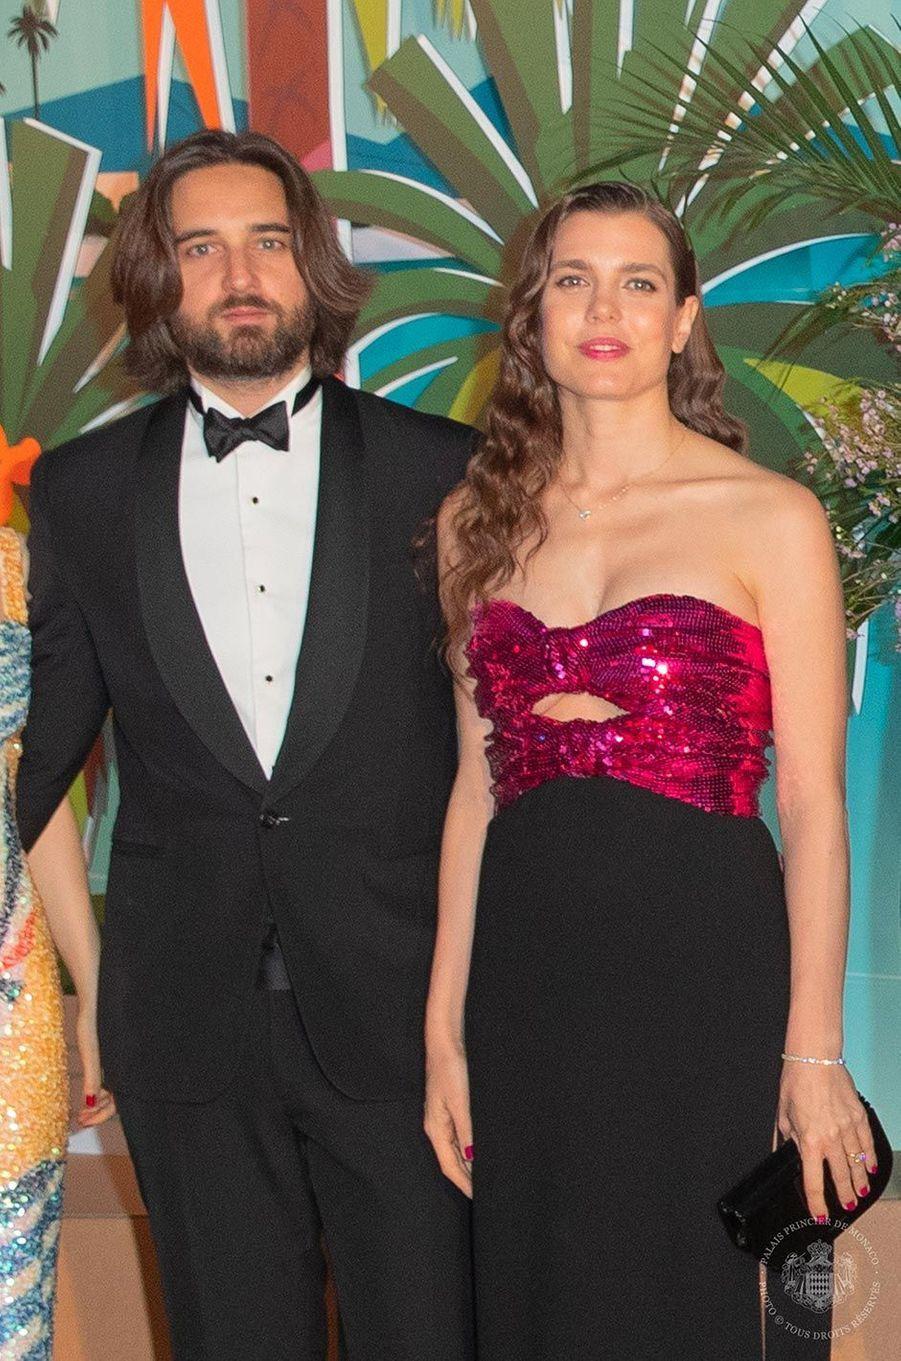 Dimitri Rassam et Charlotte Casiraghi au Bal de la Rose, au Sporting Monte-Carlo, le 30 mars 2019.